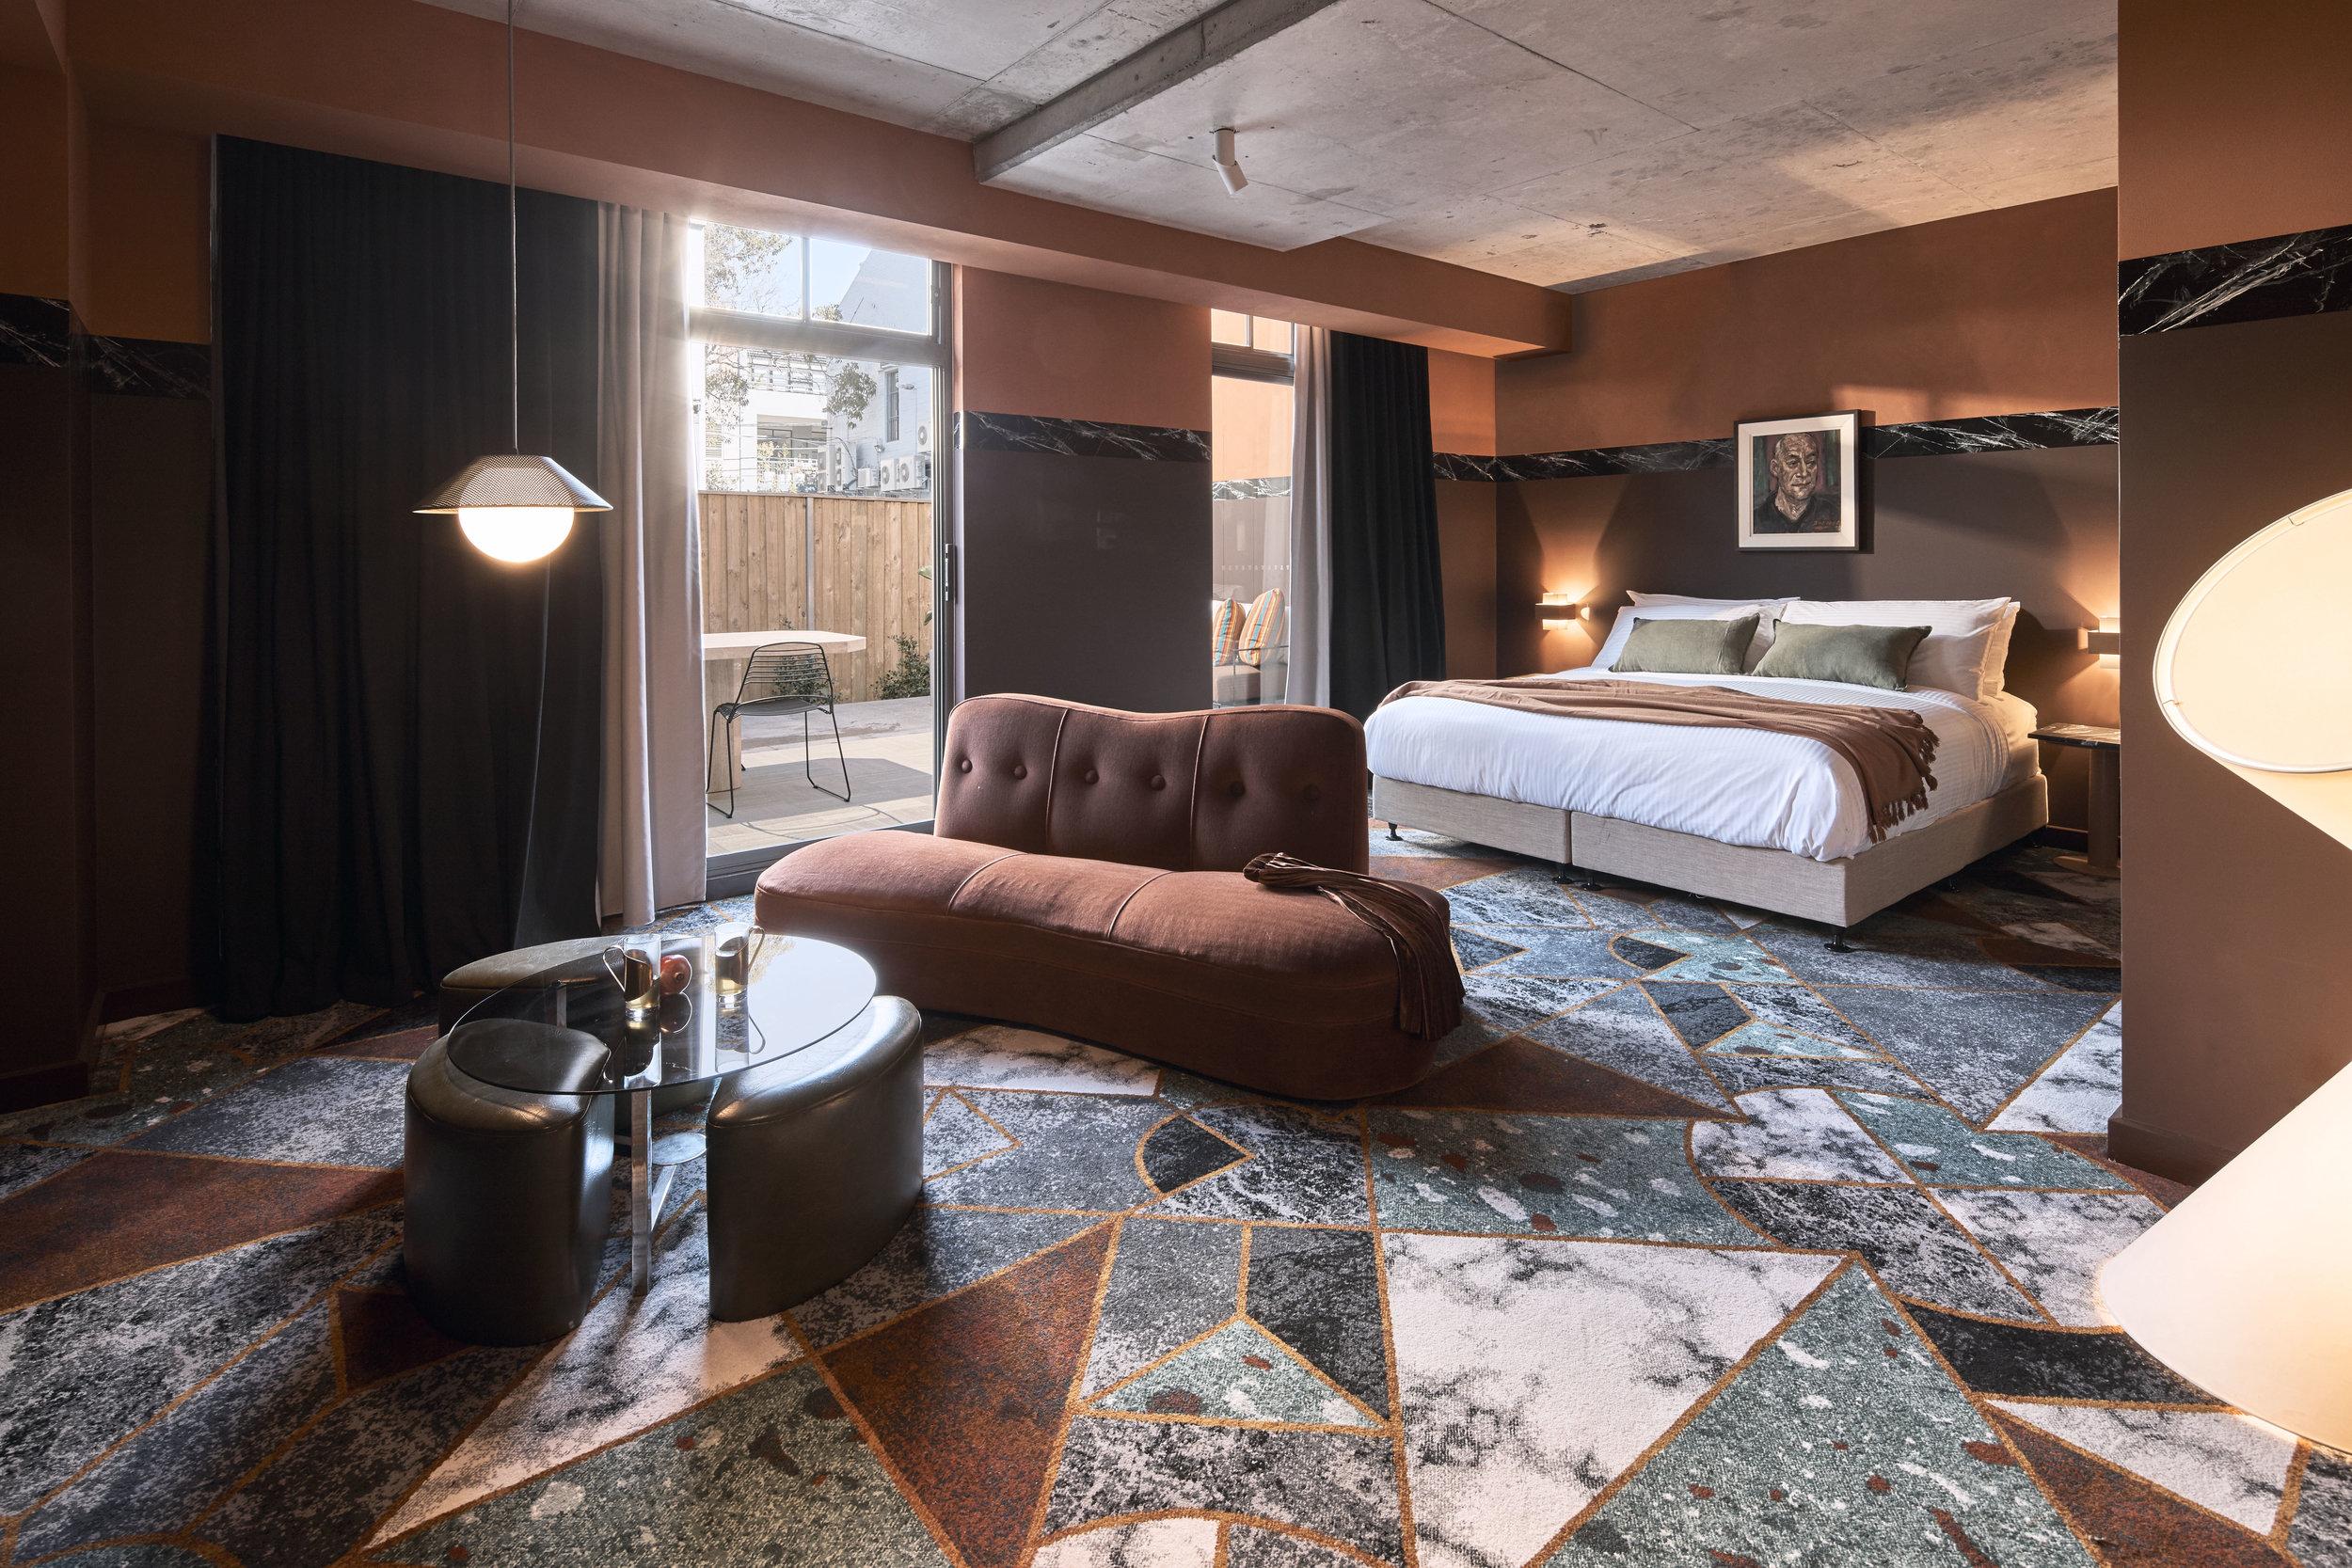 Rita Velour room by Amber Road